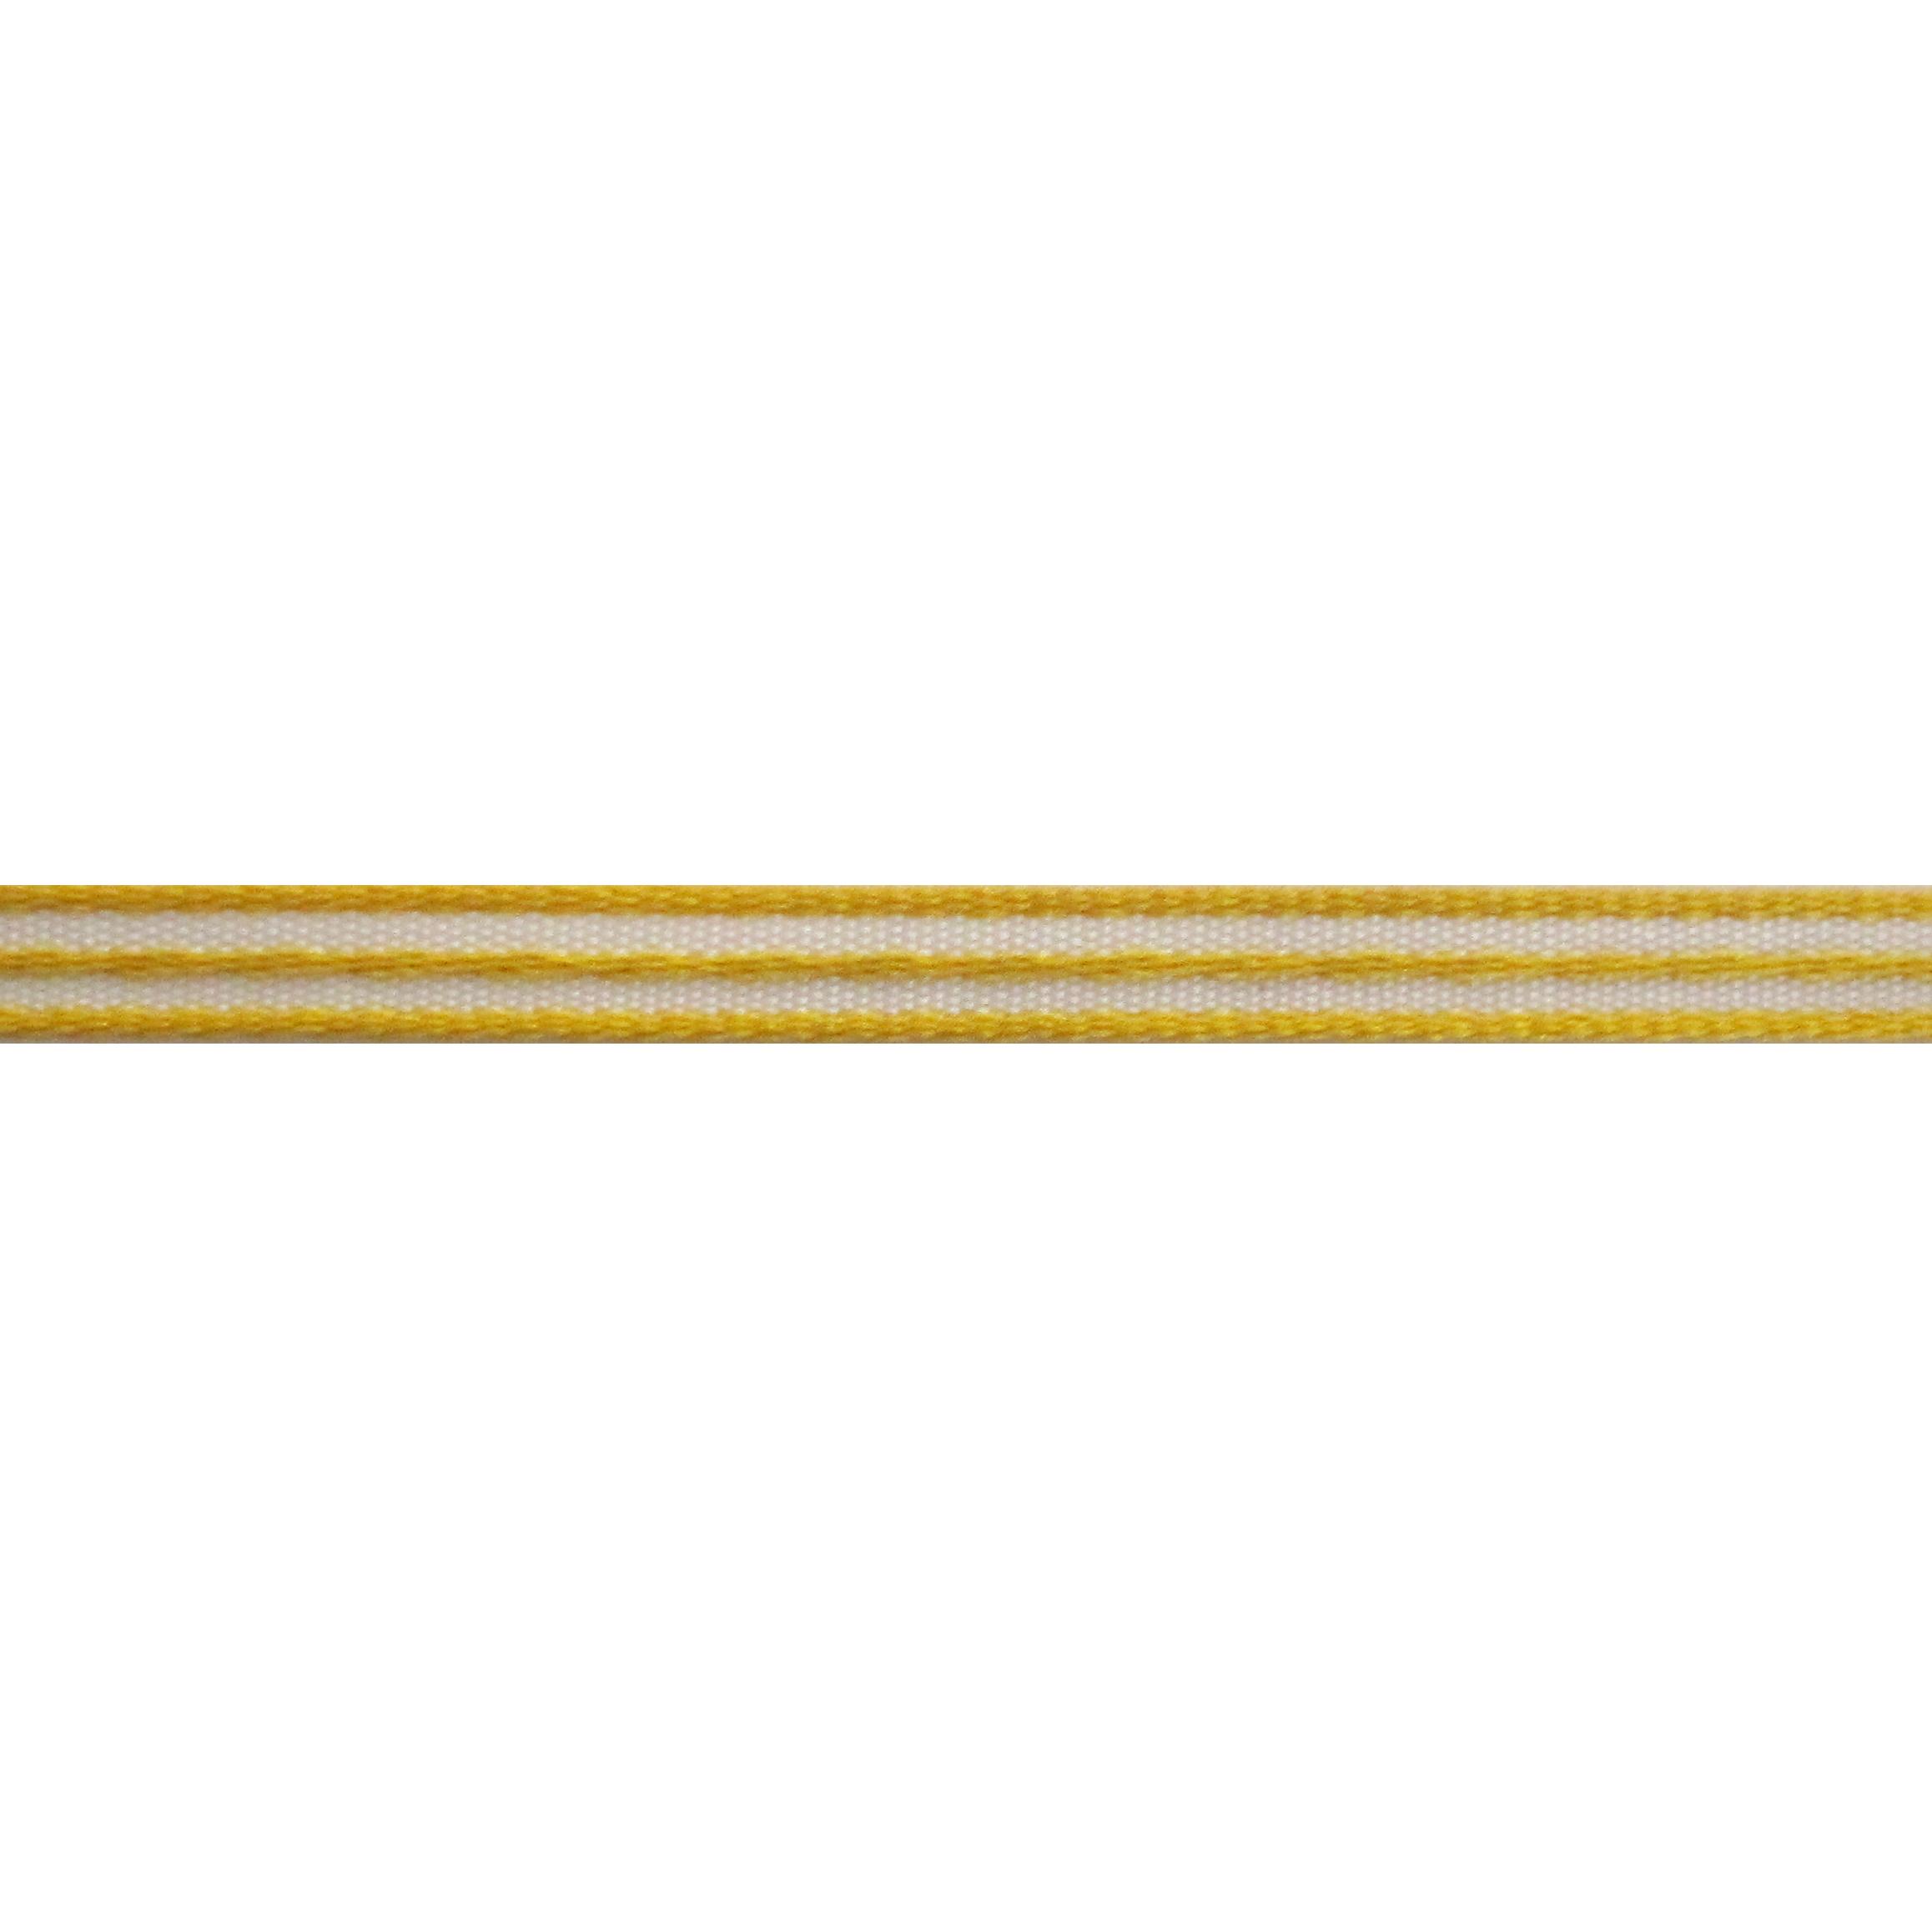 Strepenlint 5mm - Taffeta Satijn Geel Wit